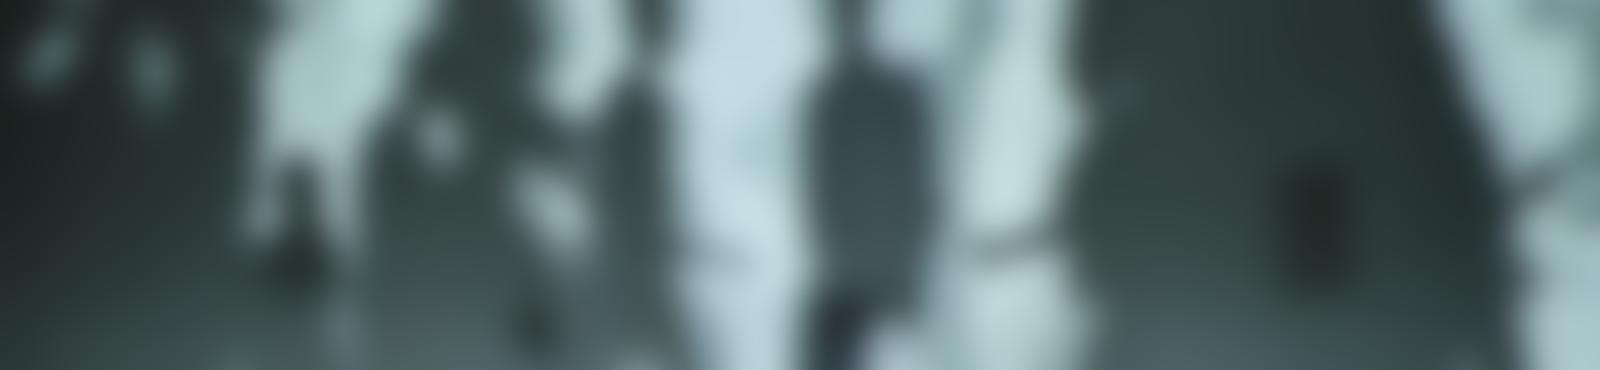 Blurred 4a9d459b 49fe 4234 a0ad 204daf6b32b8